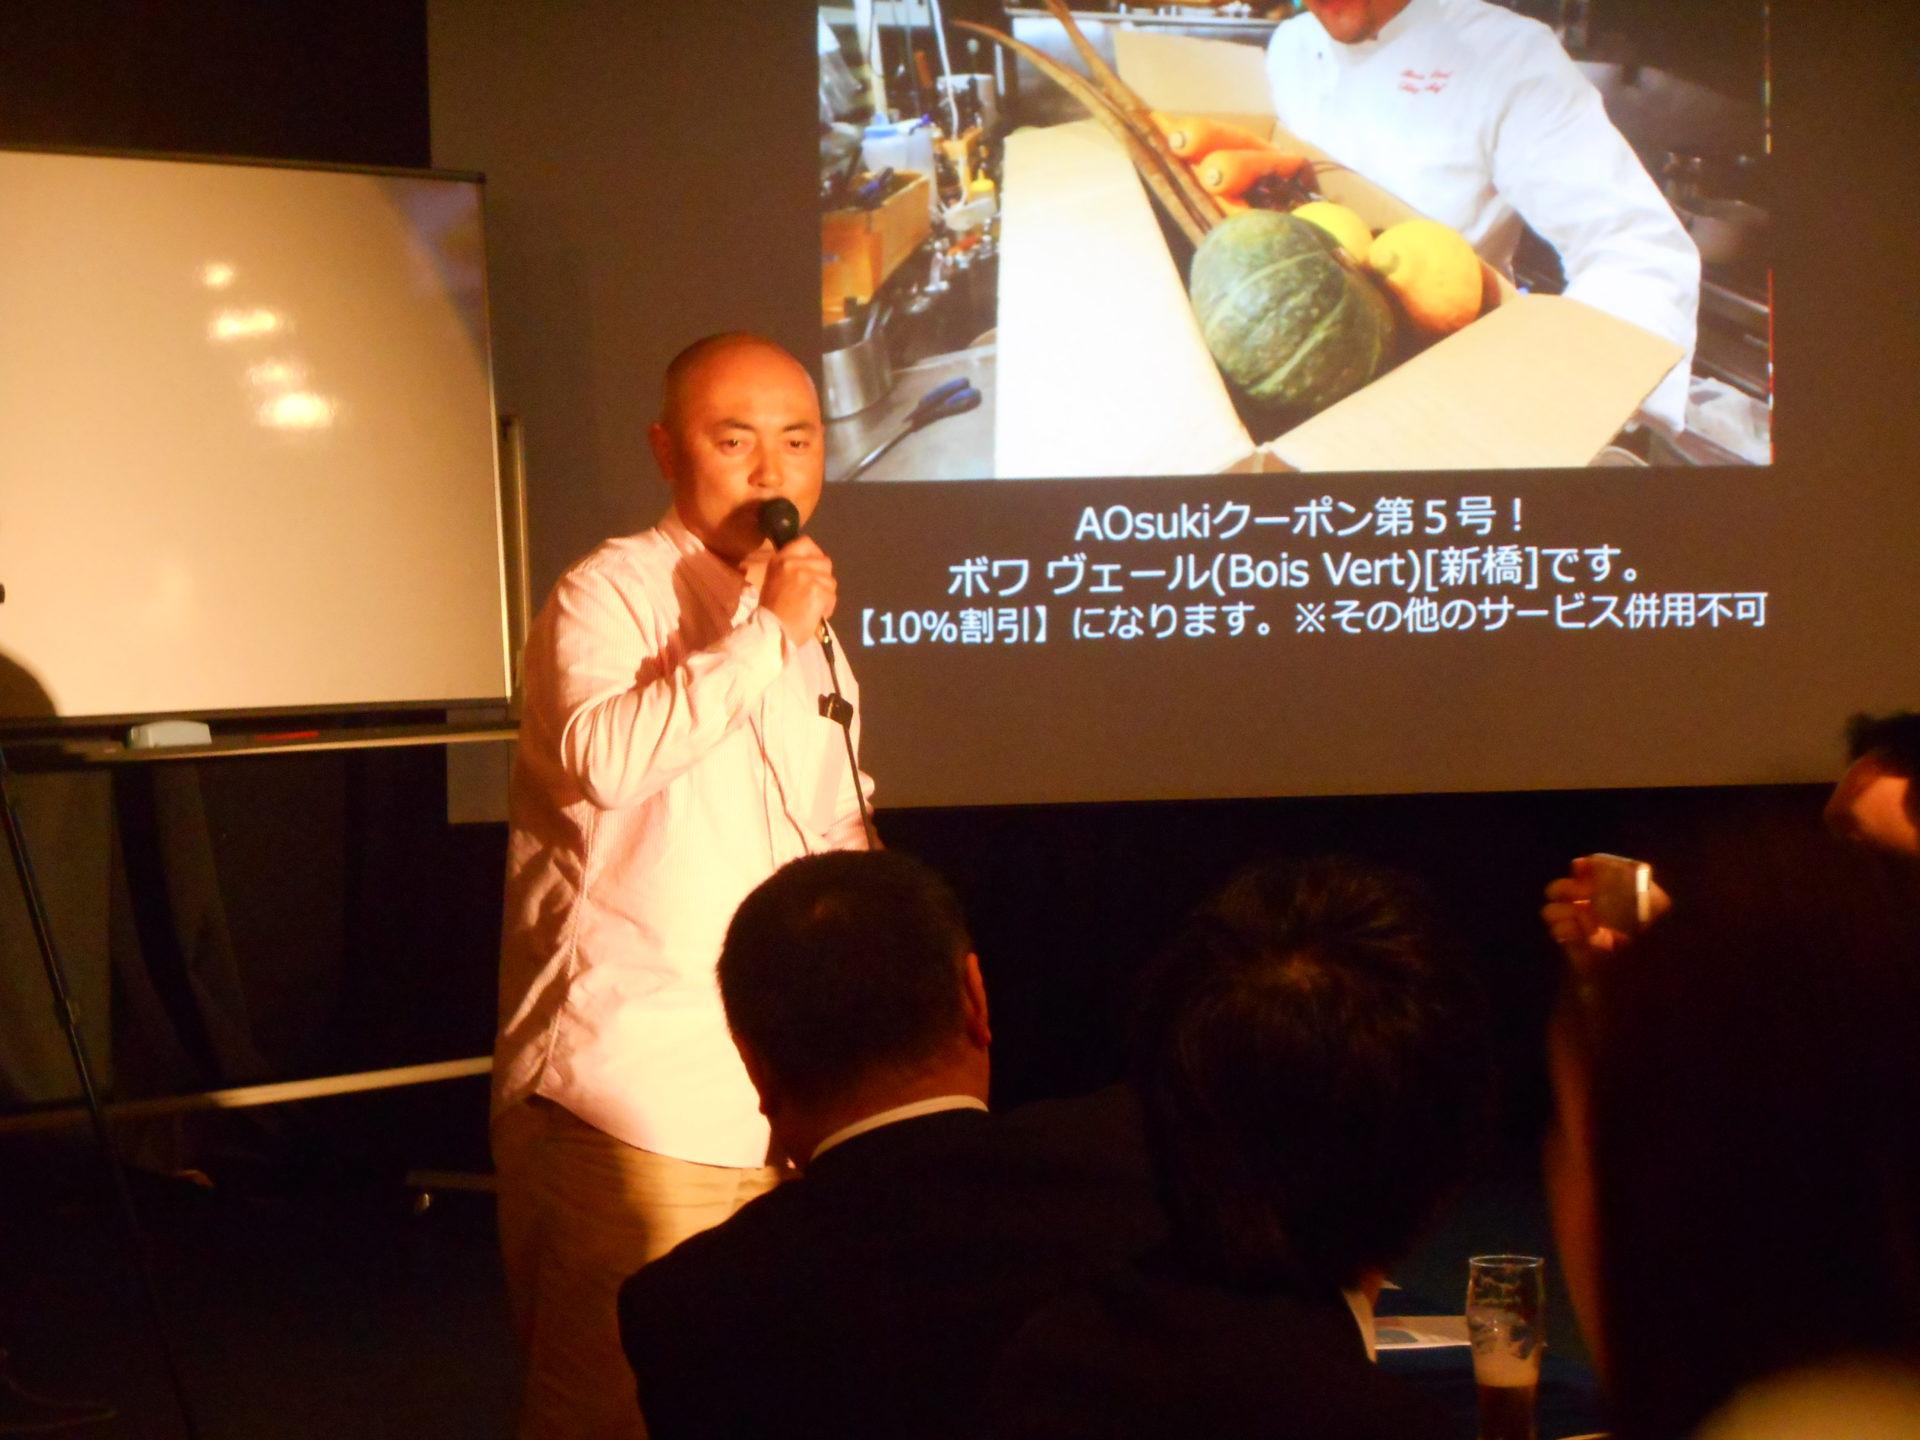 DSCN1070 1920x1440 - 2016年3月11日(金)AOsuki総会&パーティー開催しました。